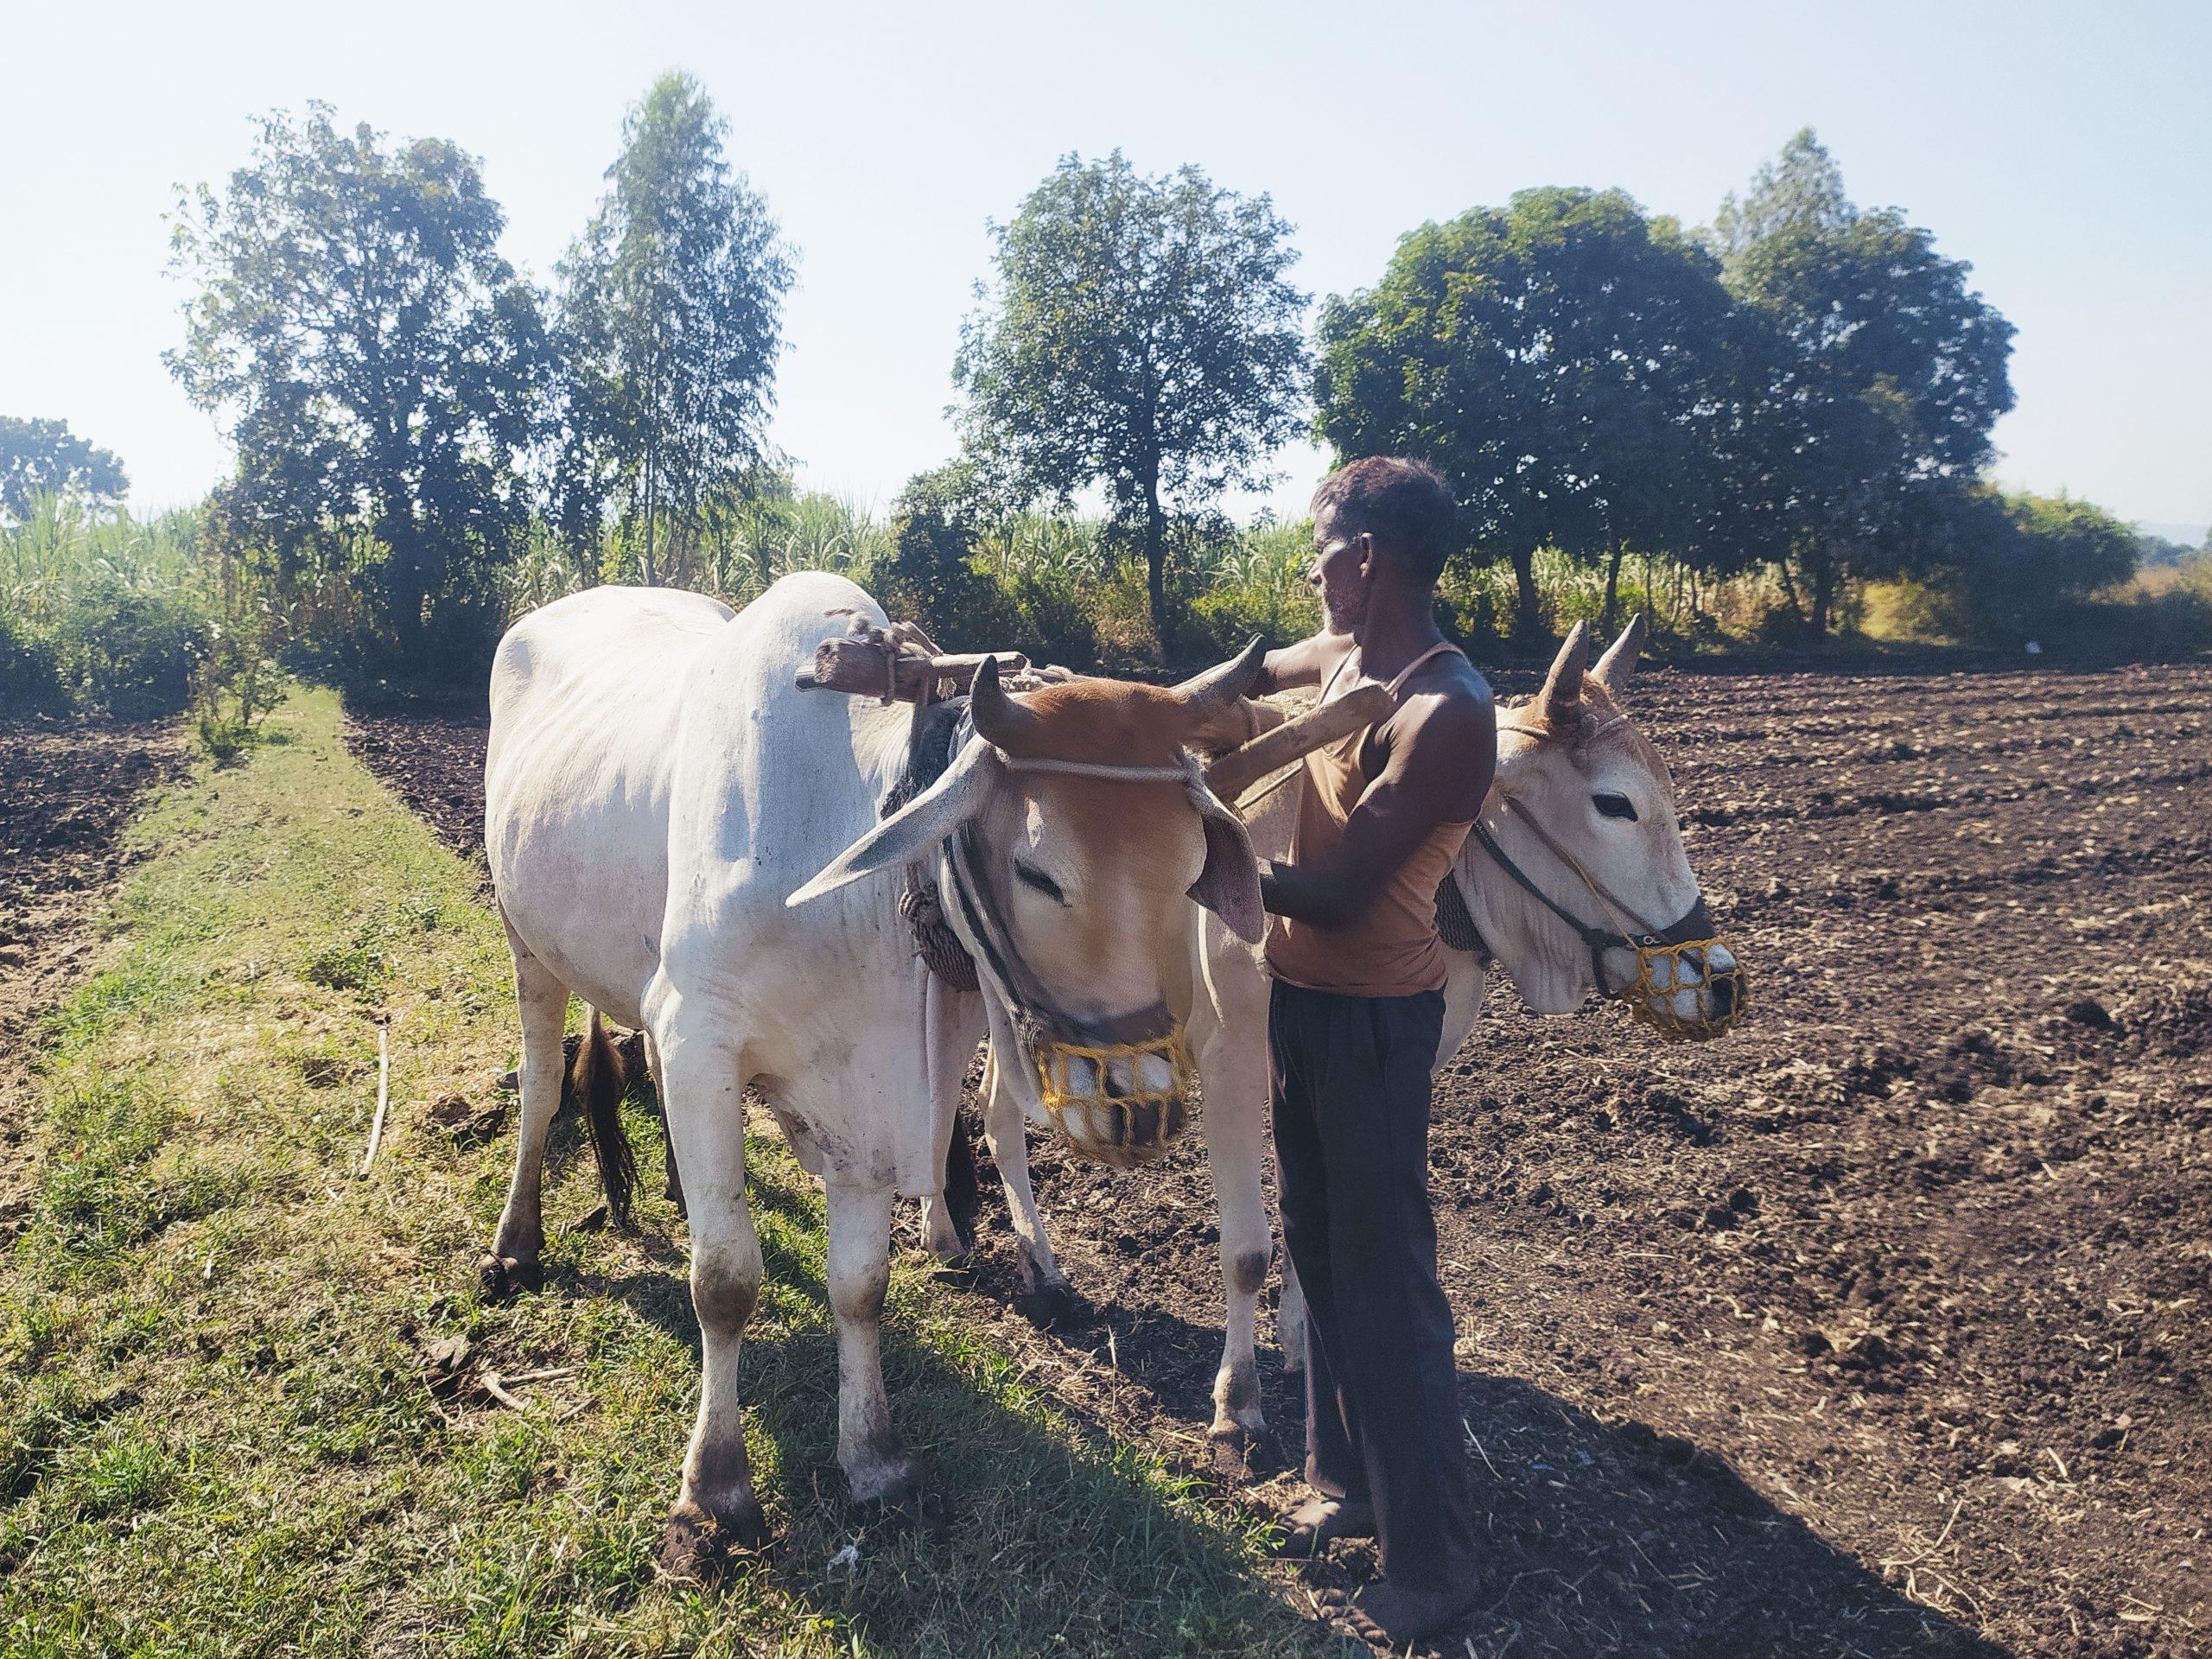 A farmer preparing his oxen